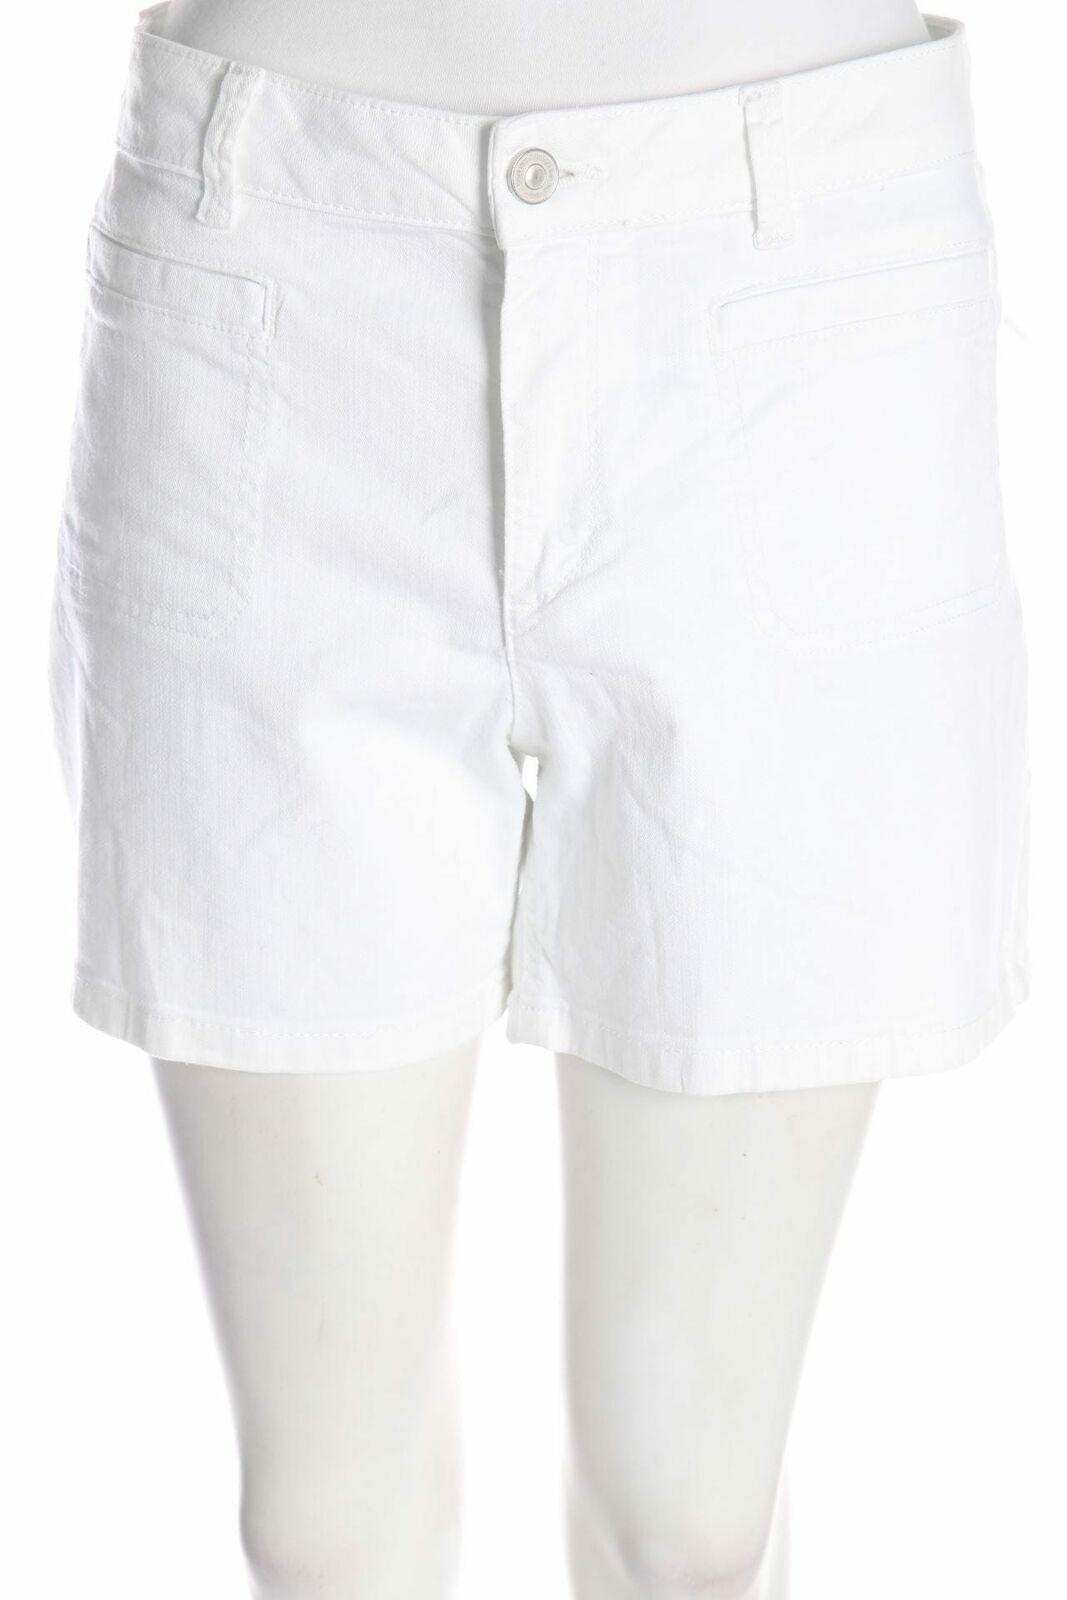 C&A Shorts D 42 weiß